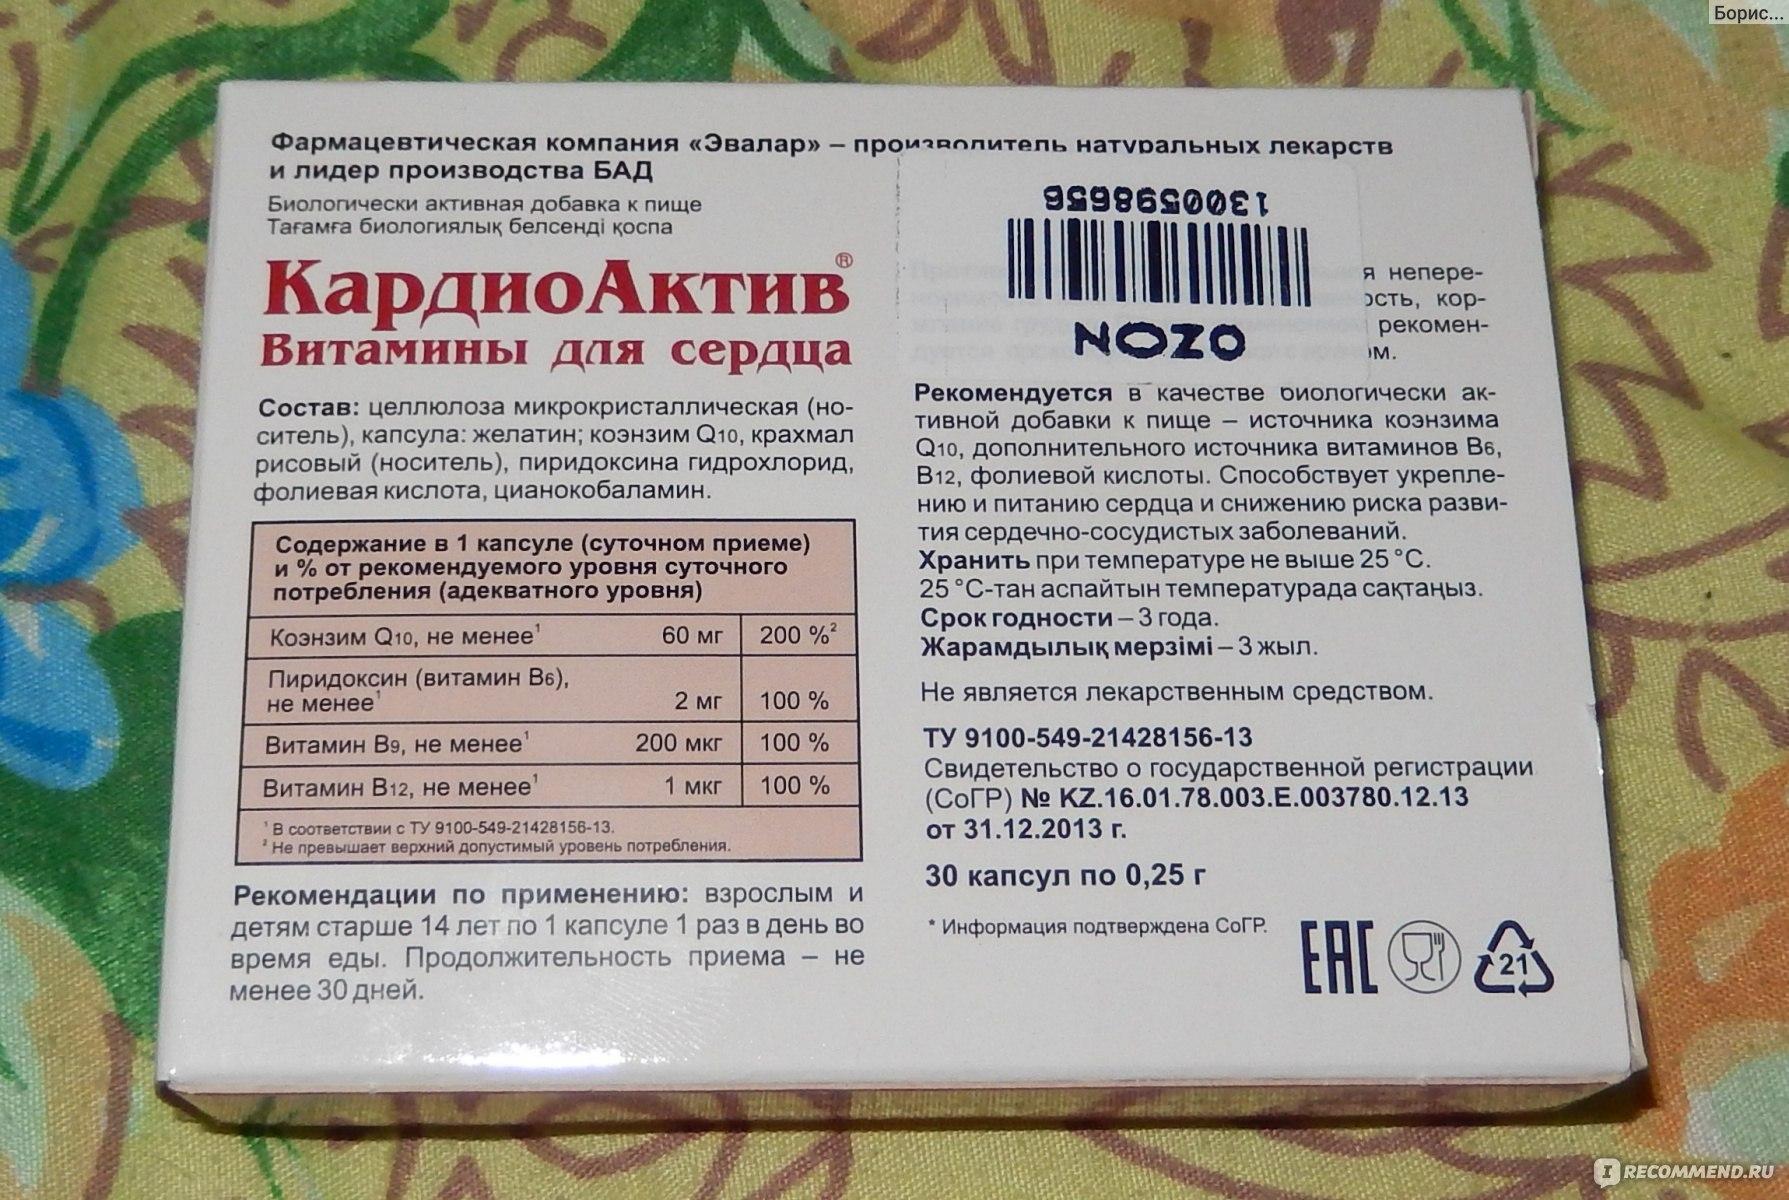 Кардиоактив таурин эвалар. цена, инструкция по применению, состав, аналоги